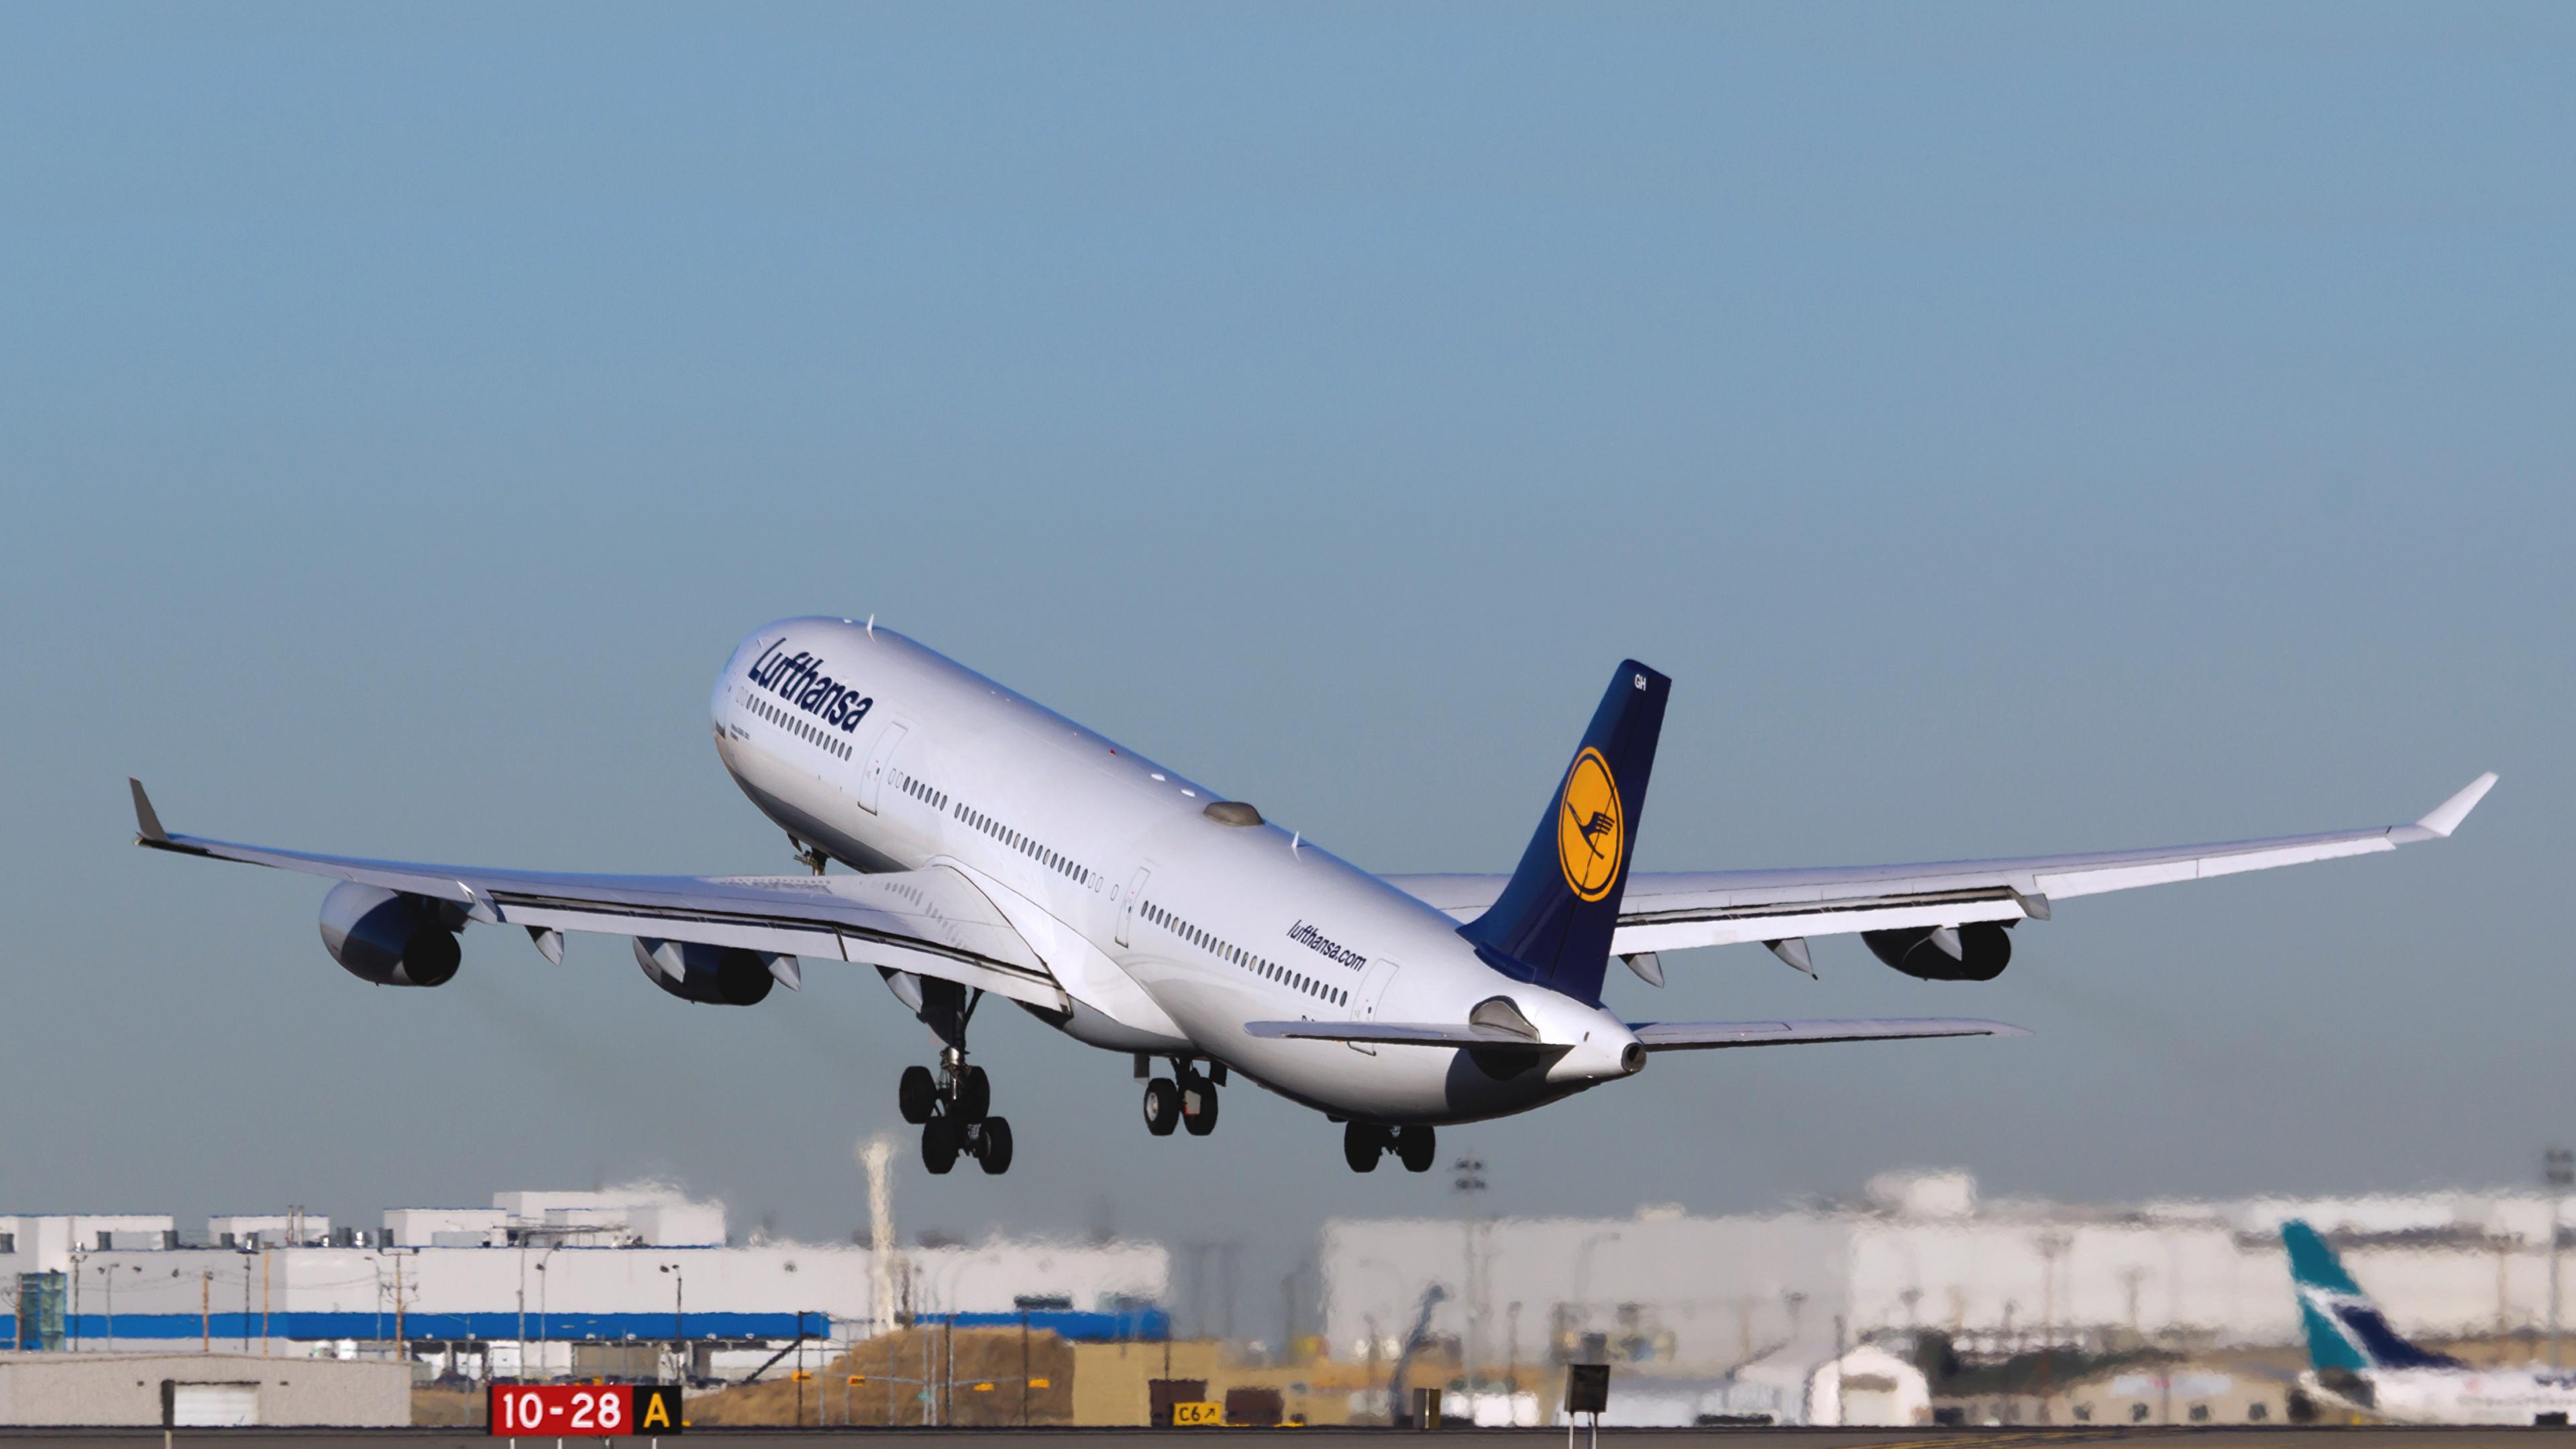 Обои Lufthansa. Авиация foto 14